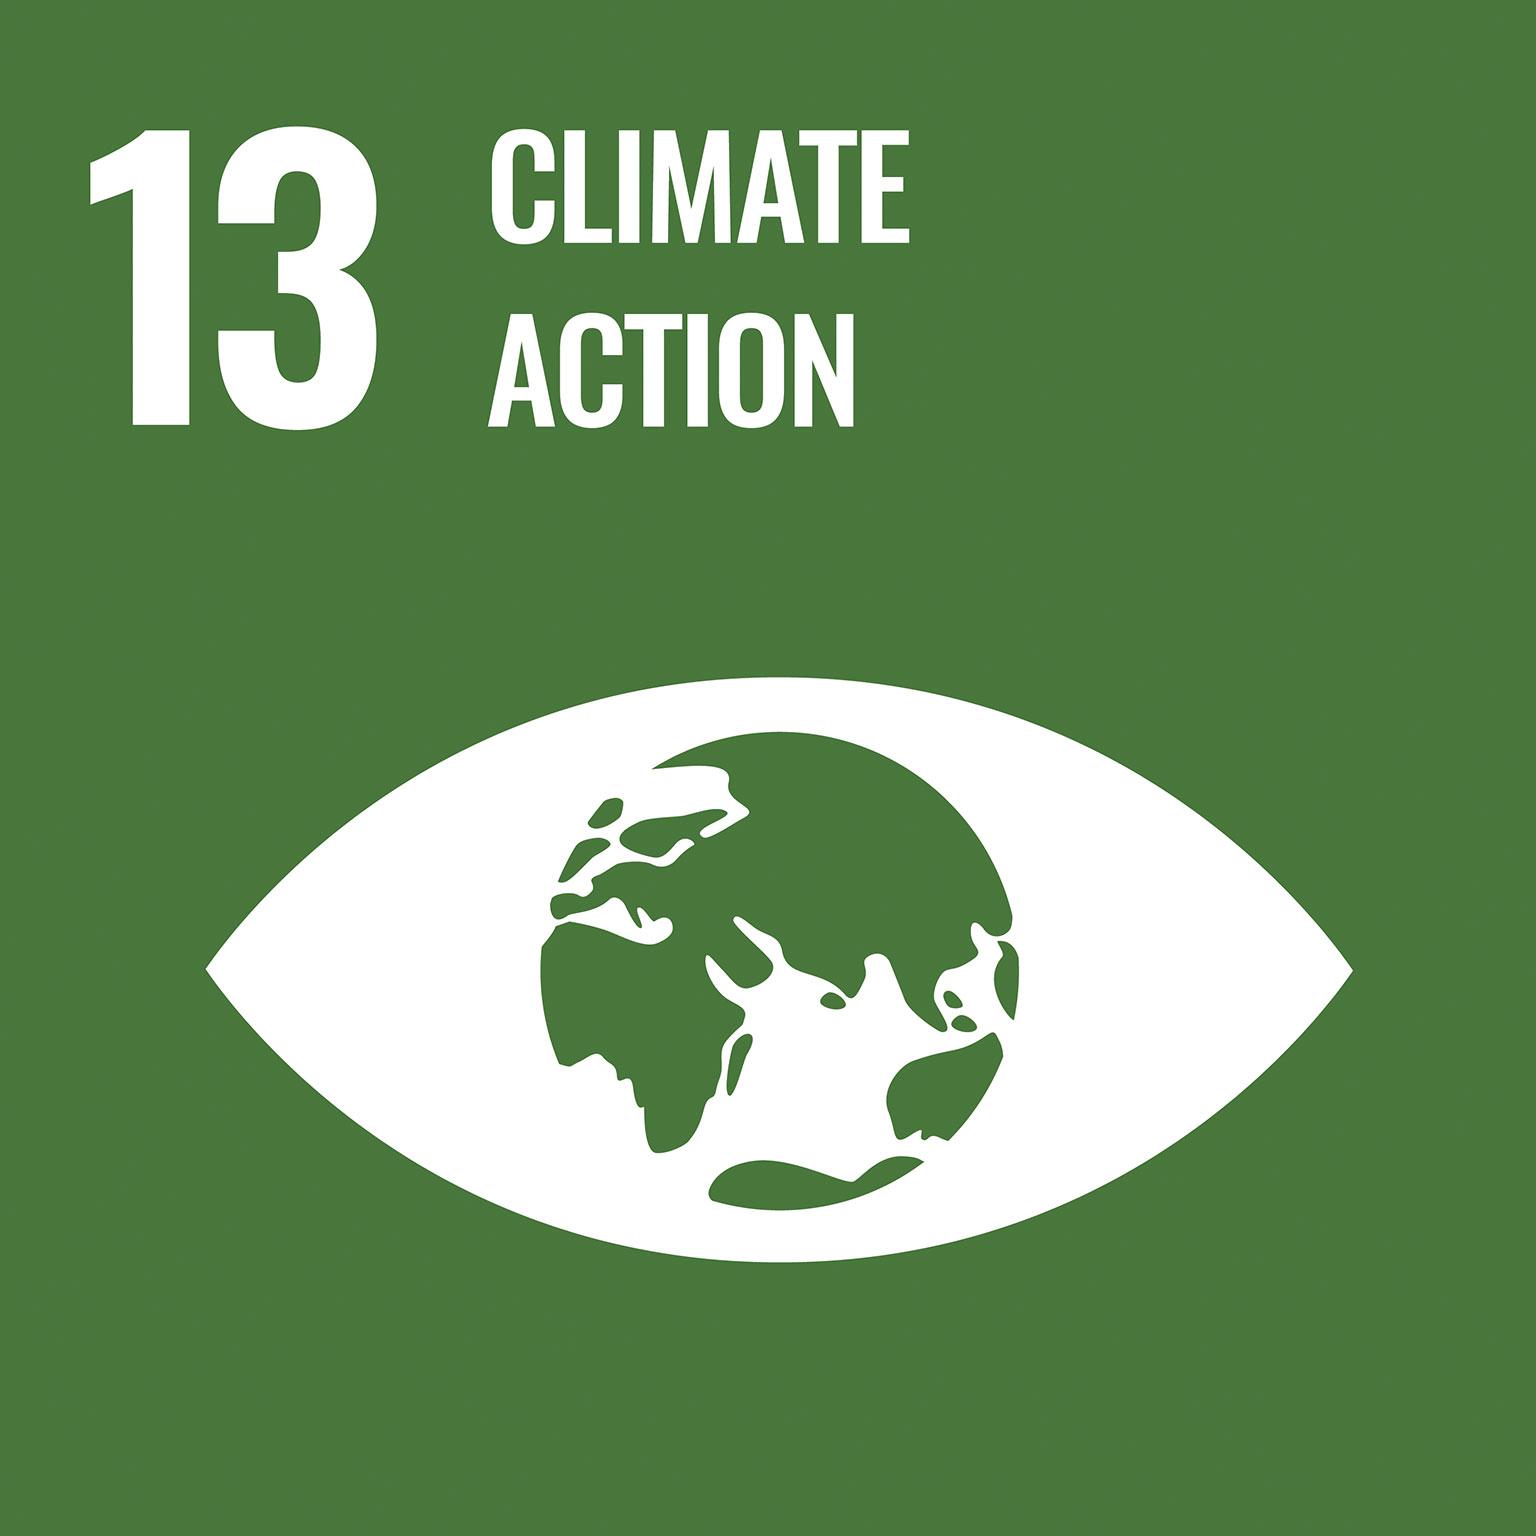 sustainable development goals: climate action